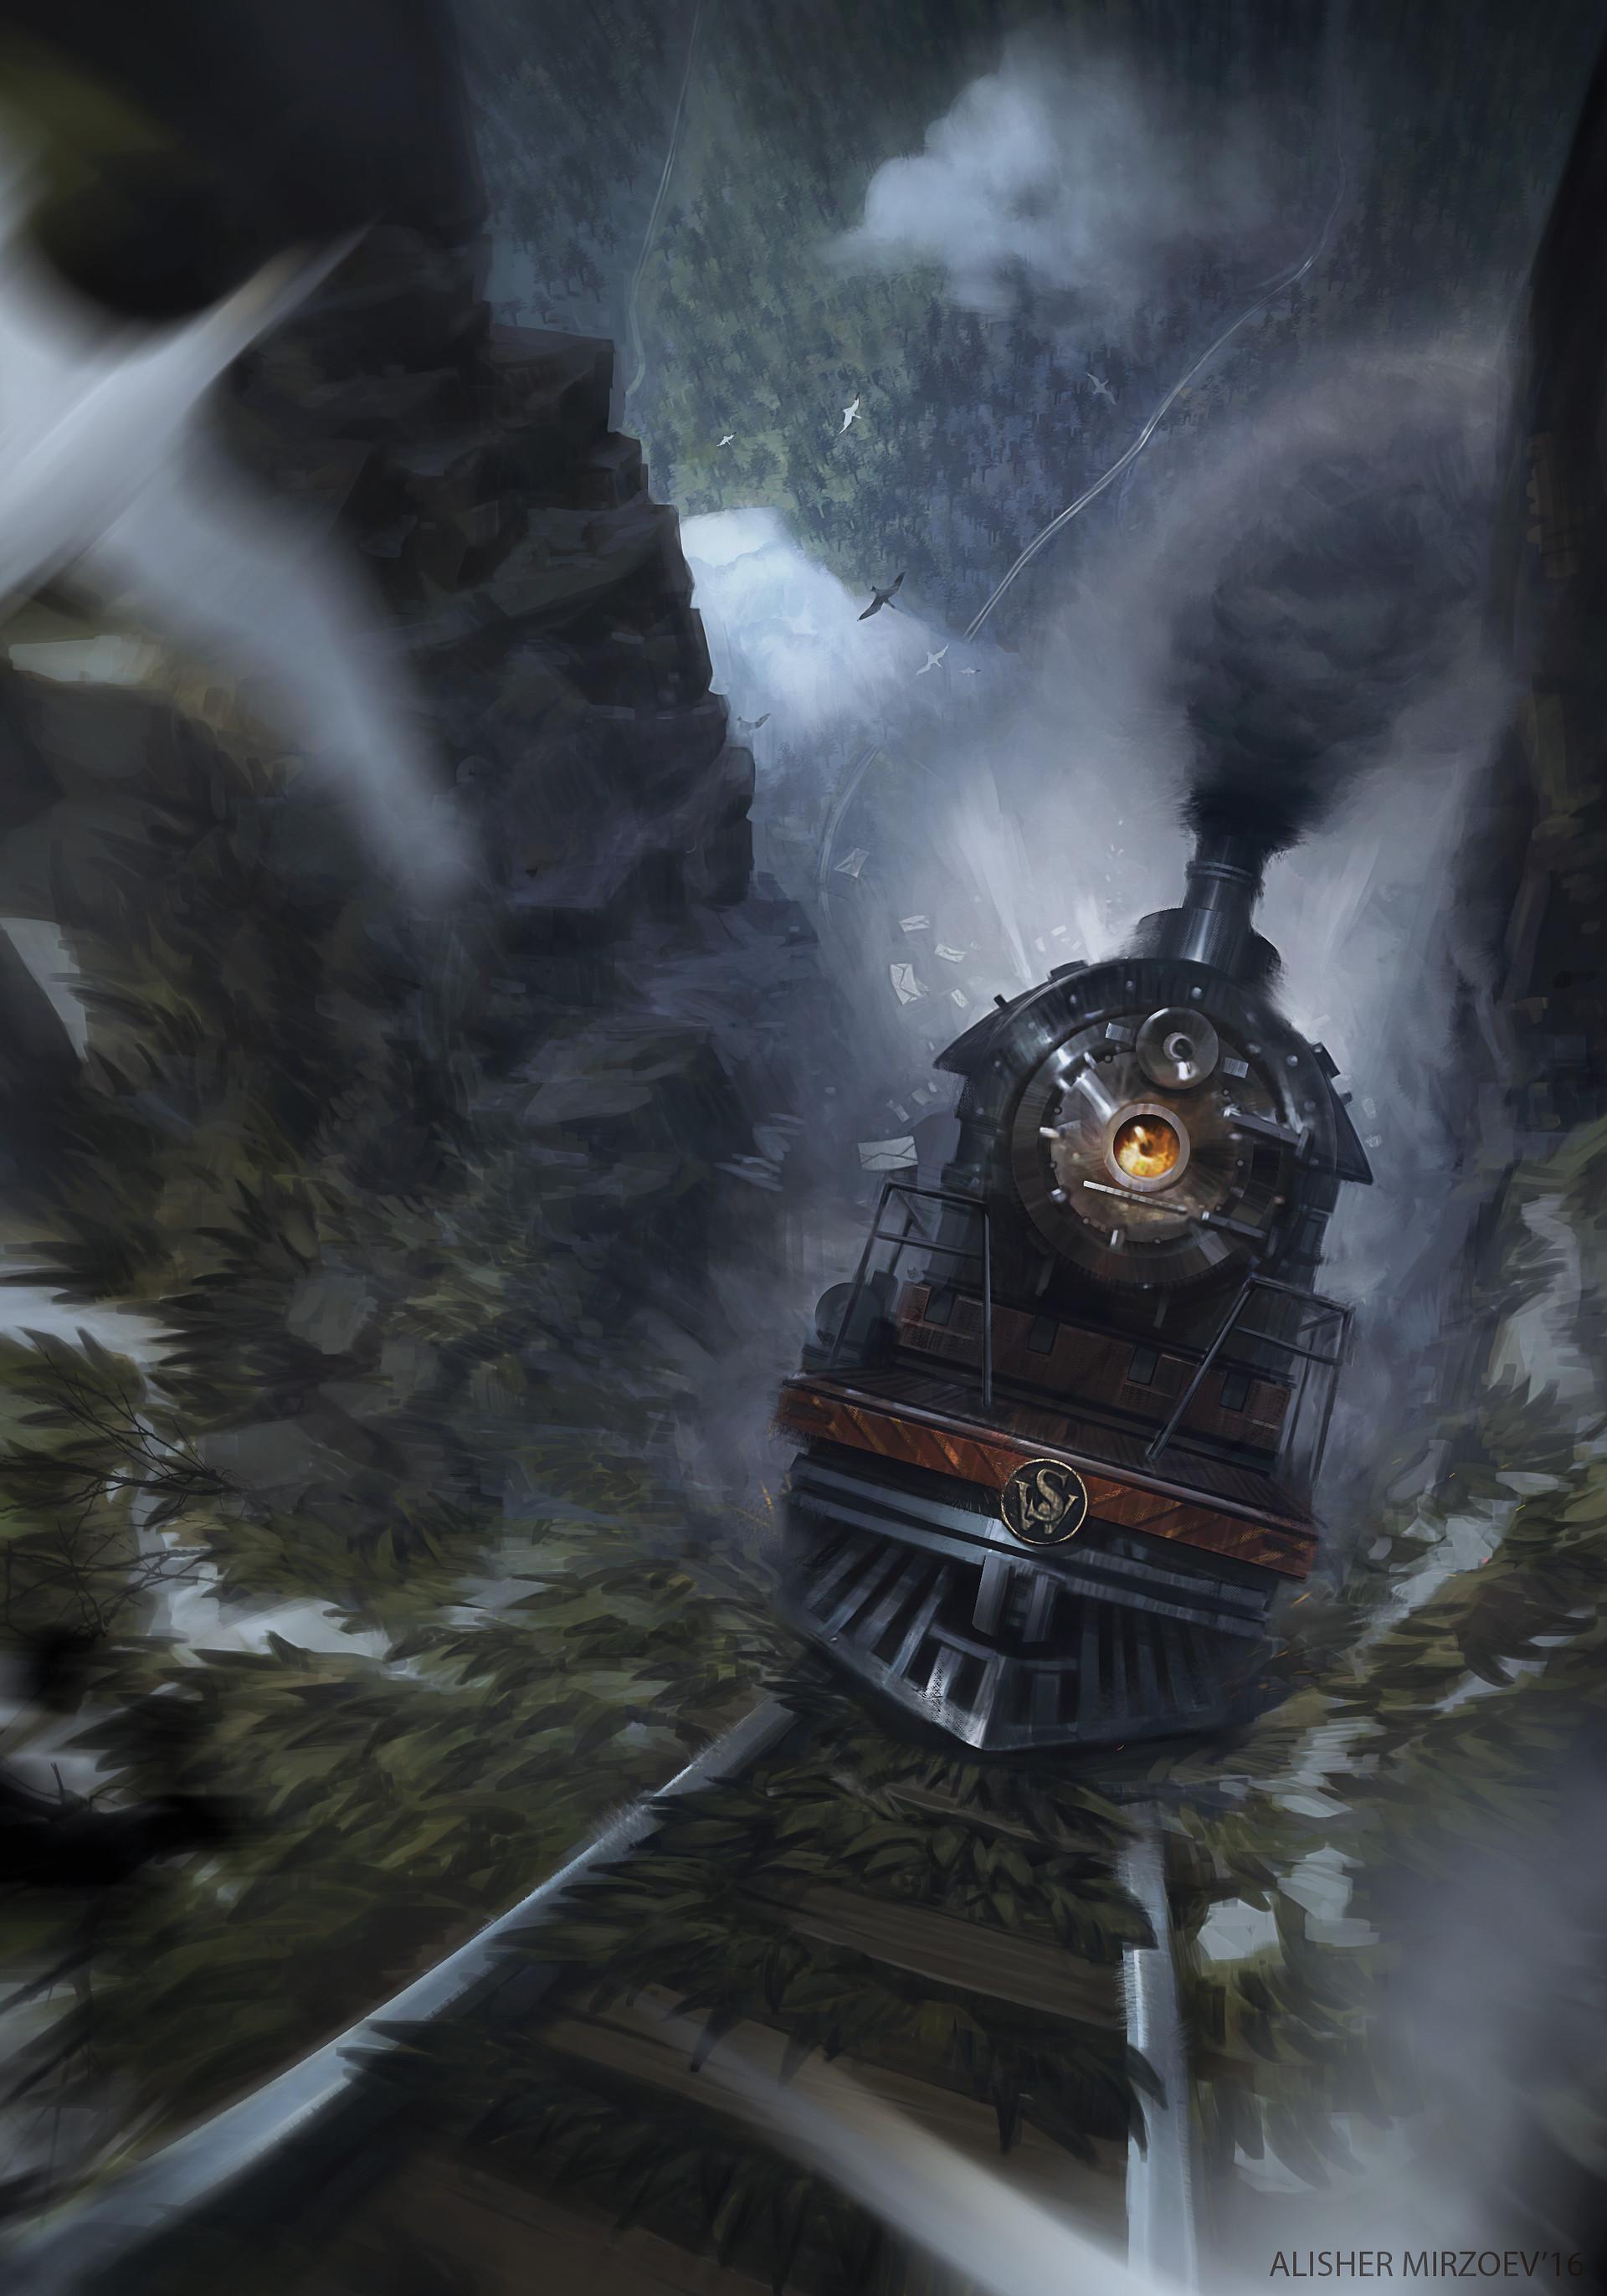 Alisher mirzoev pf train final 1